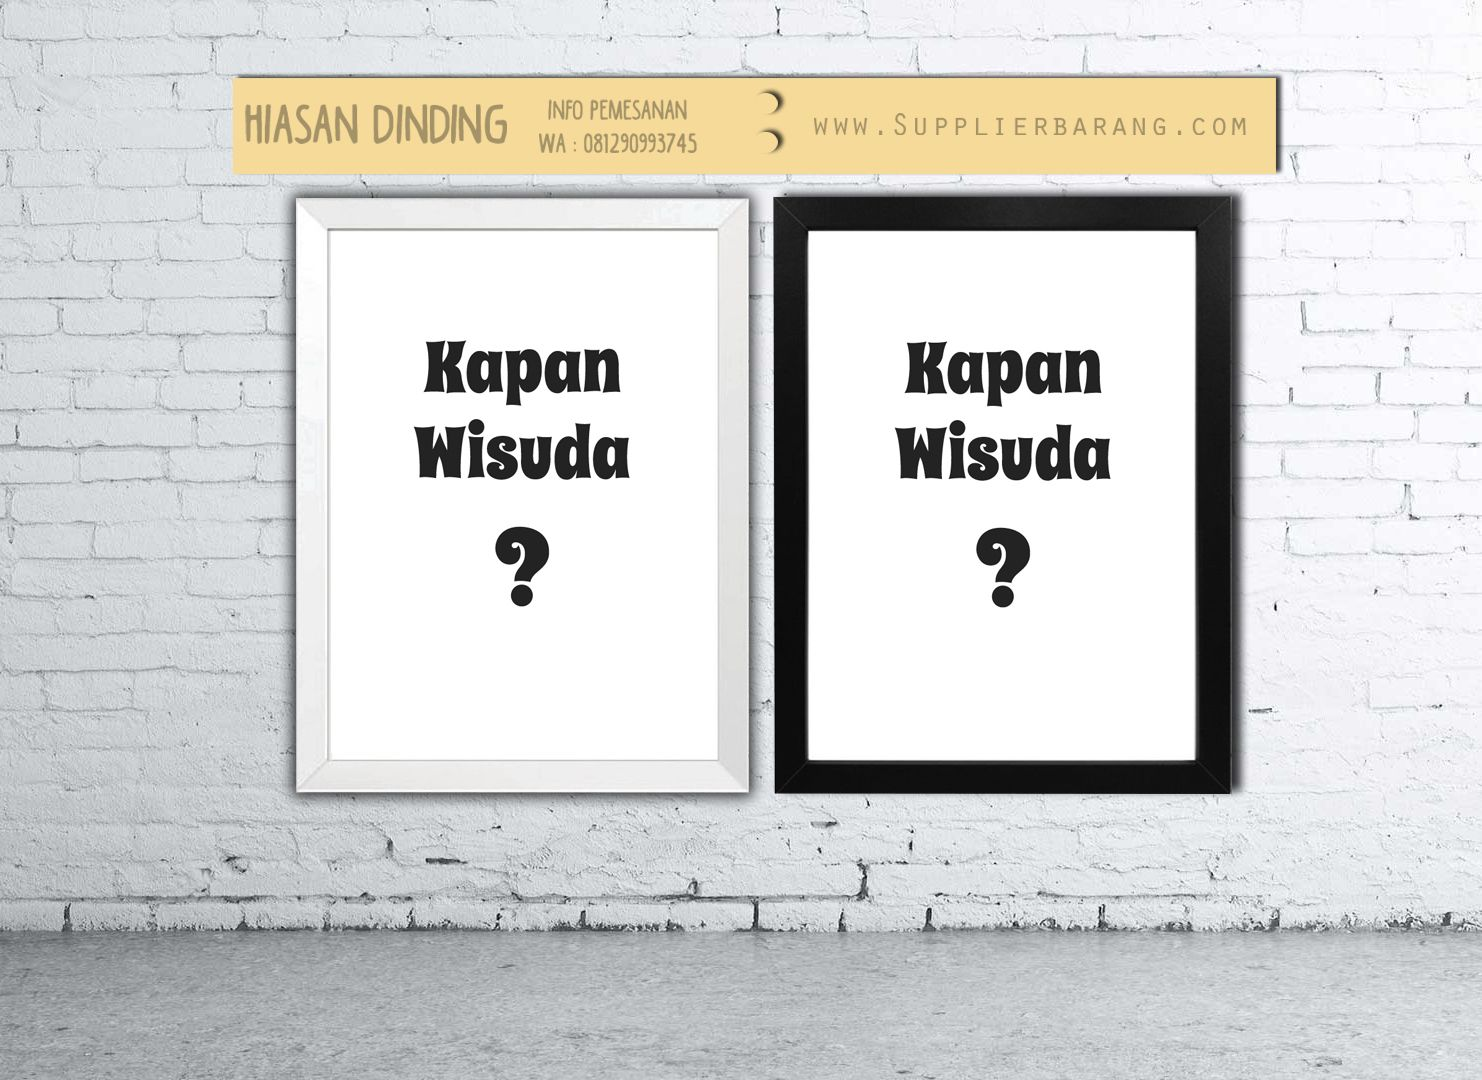 Frame Motivasi Untuk Dinding Rumah A 21 Hitam Daftar Harga Terbaru Ikea Nyttja Bingkai 25x34cm Hiasan Poster Edyz Instagram Ukuran Cm X 30 Bahan